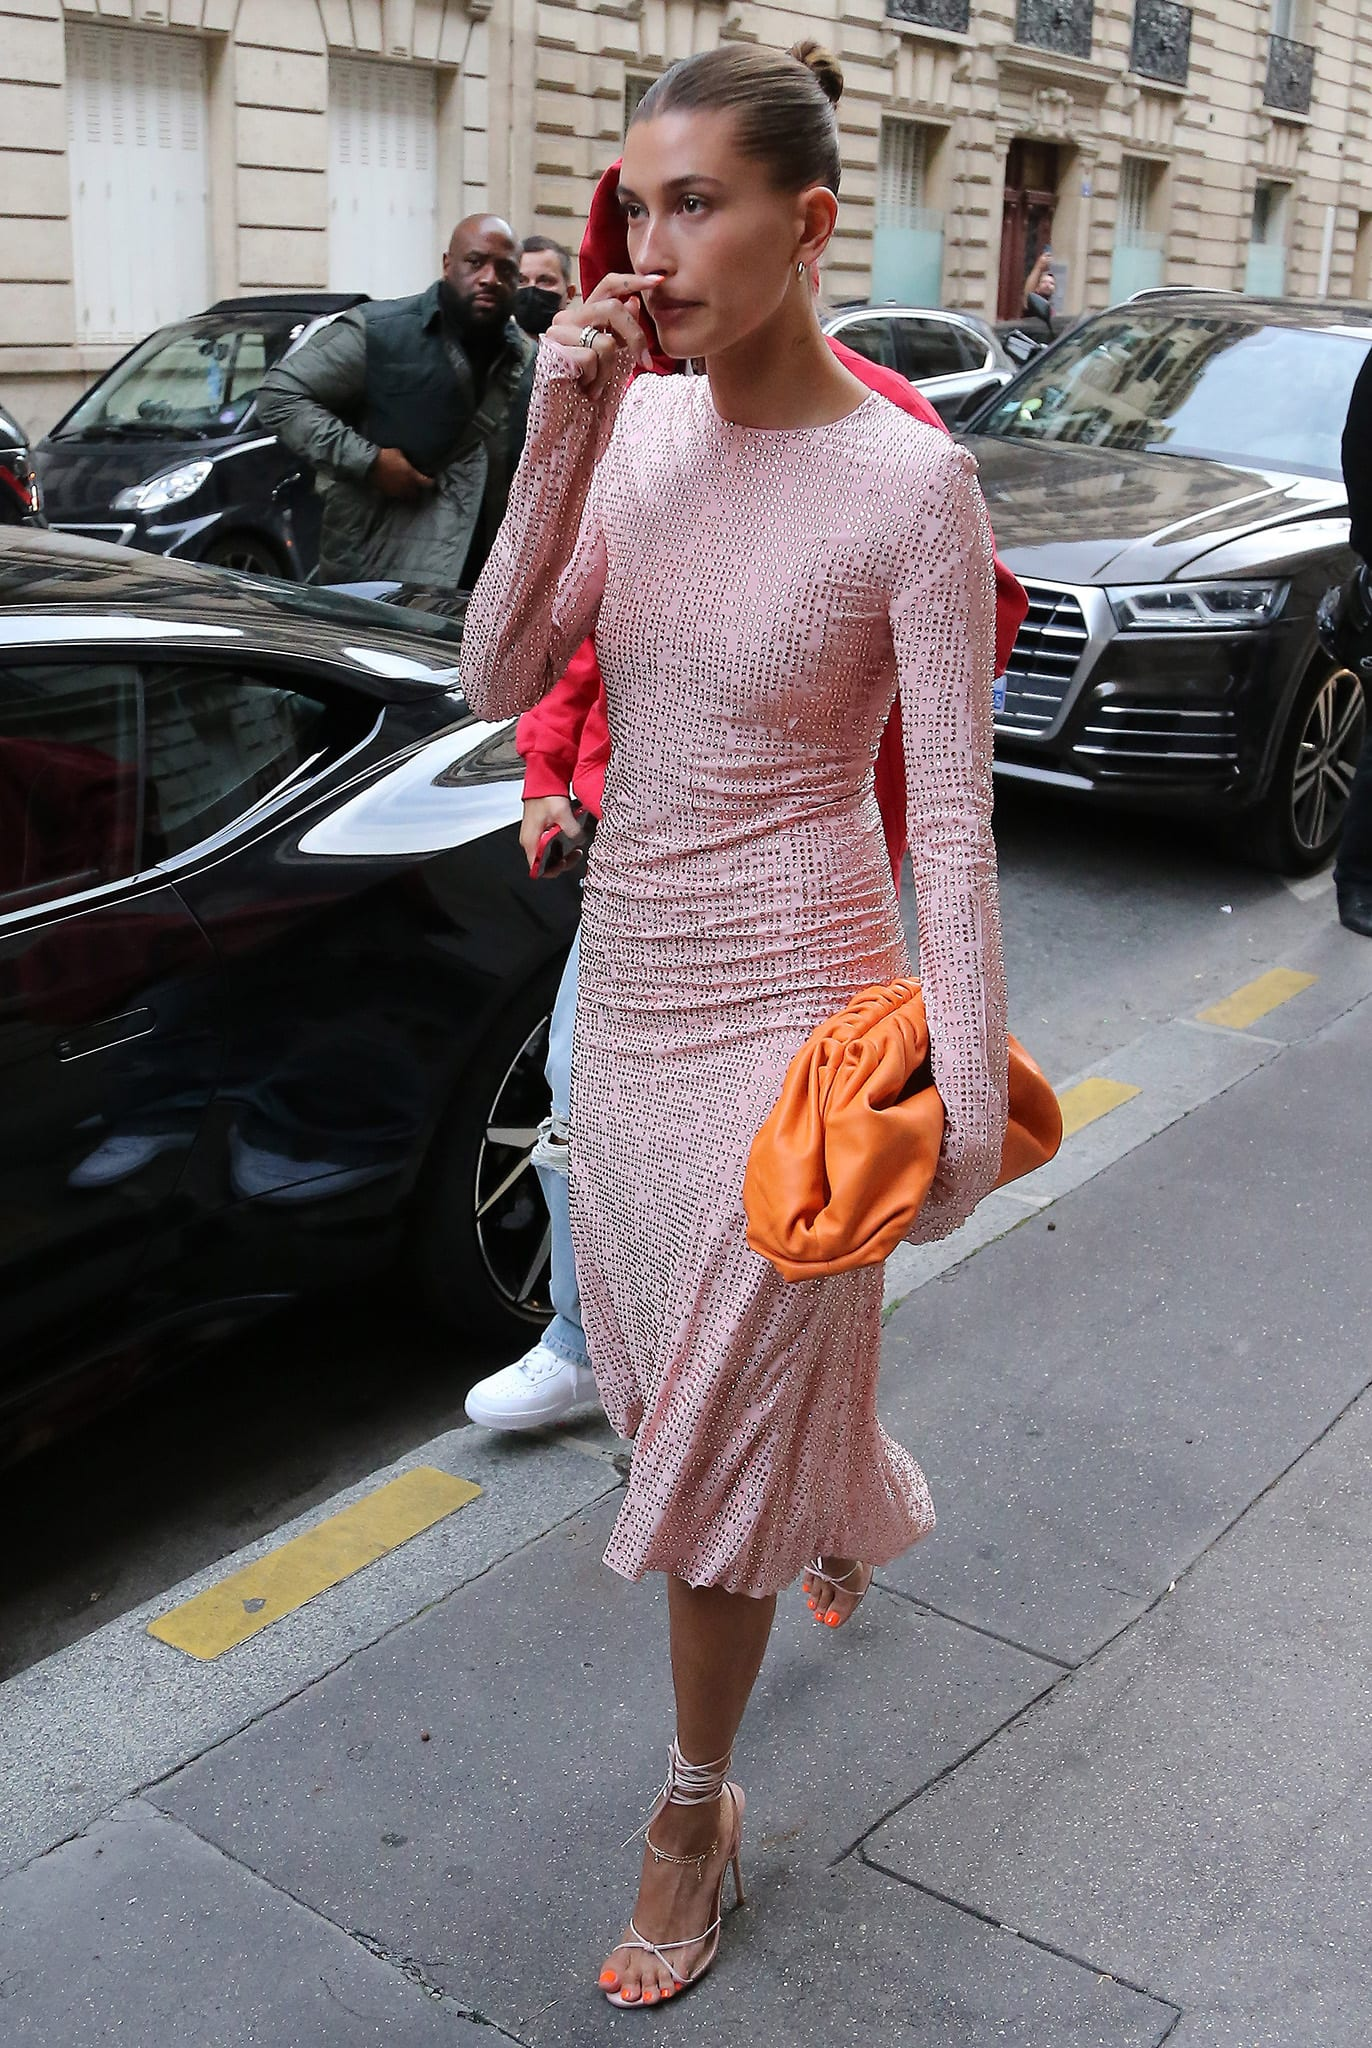 Hailey Bieber is pretty in a pink Miu Miu Fall 2021 embellished dress